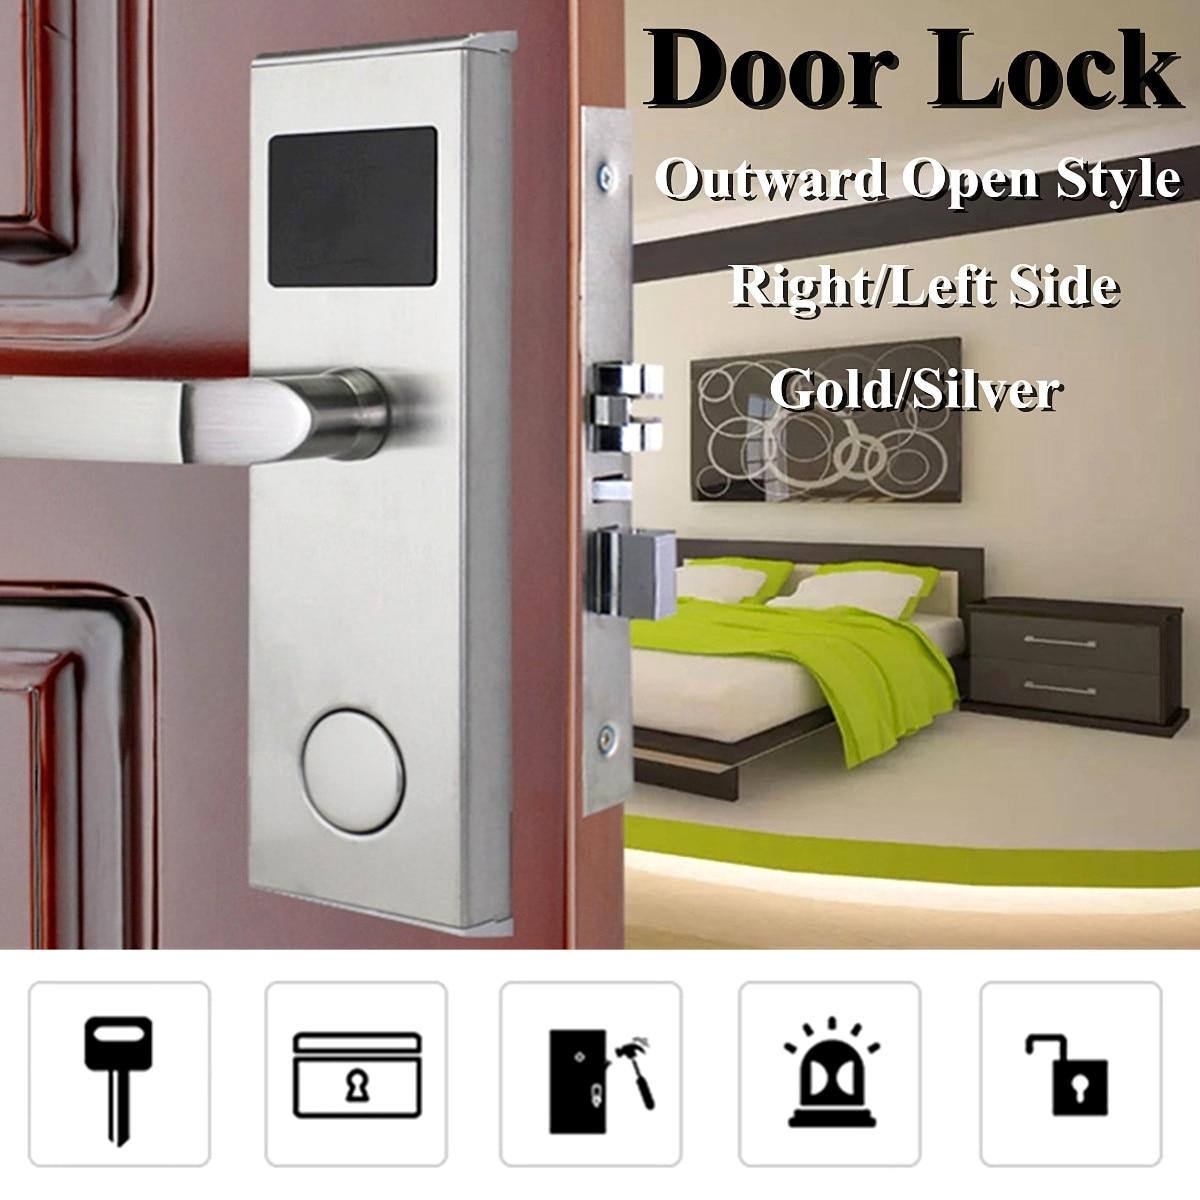 Safurance Digital Card Lock Security Intelligent RFID Digital Card Key Unlock Stainless Steel Hotel Door Lock System Door Locks